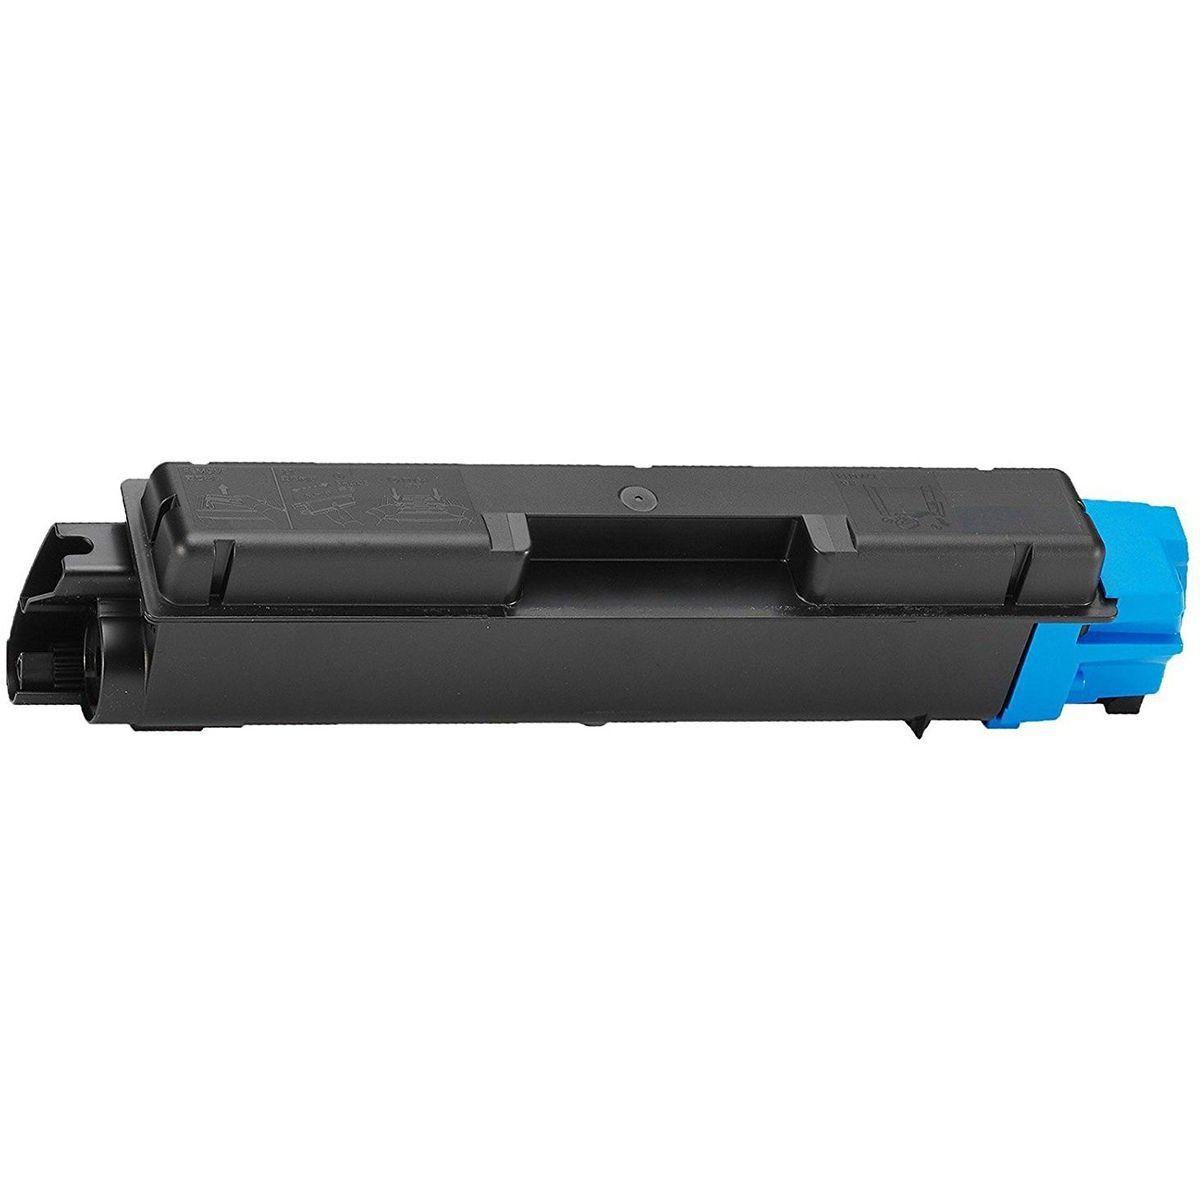 Compatível: Toner TK-582C TK582 para Kyocera FS-C5150dn FS-C5150 FSC5150dn FSC5150 P6021cdn P6021 / Ciano / 2.800